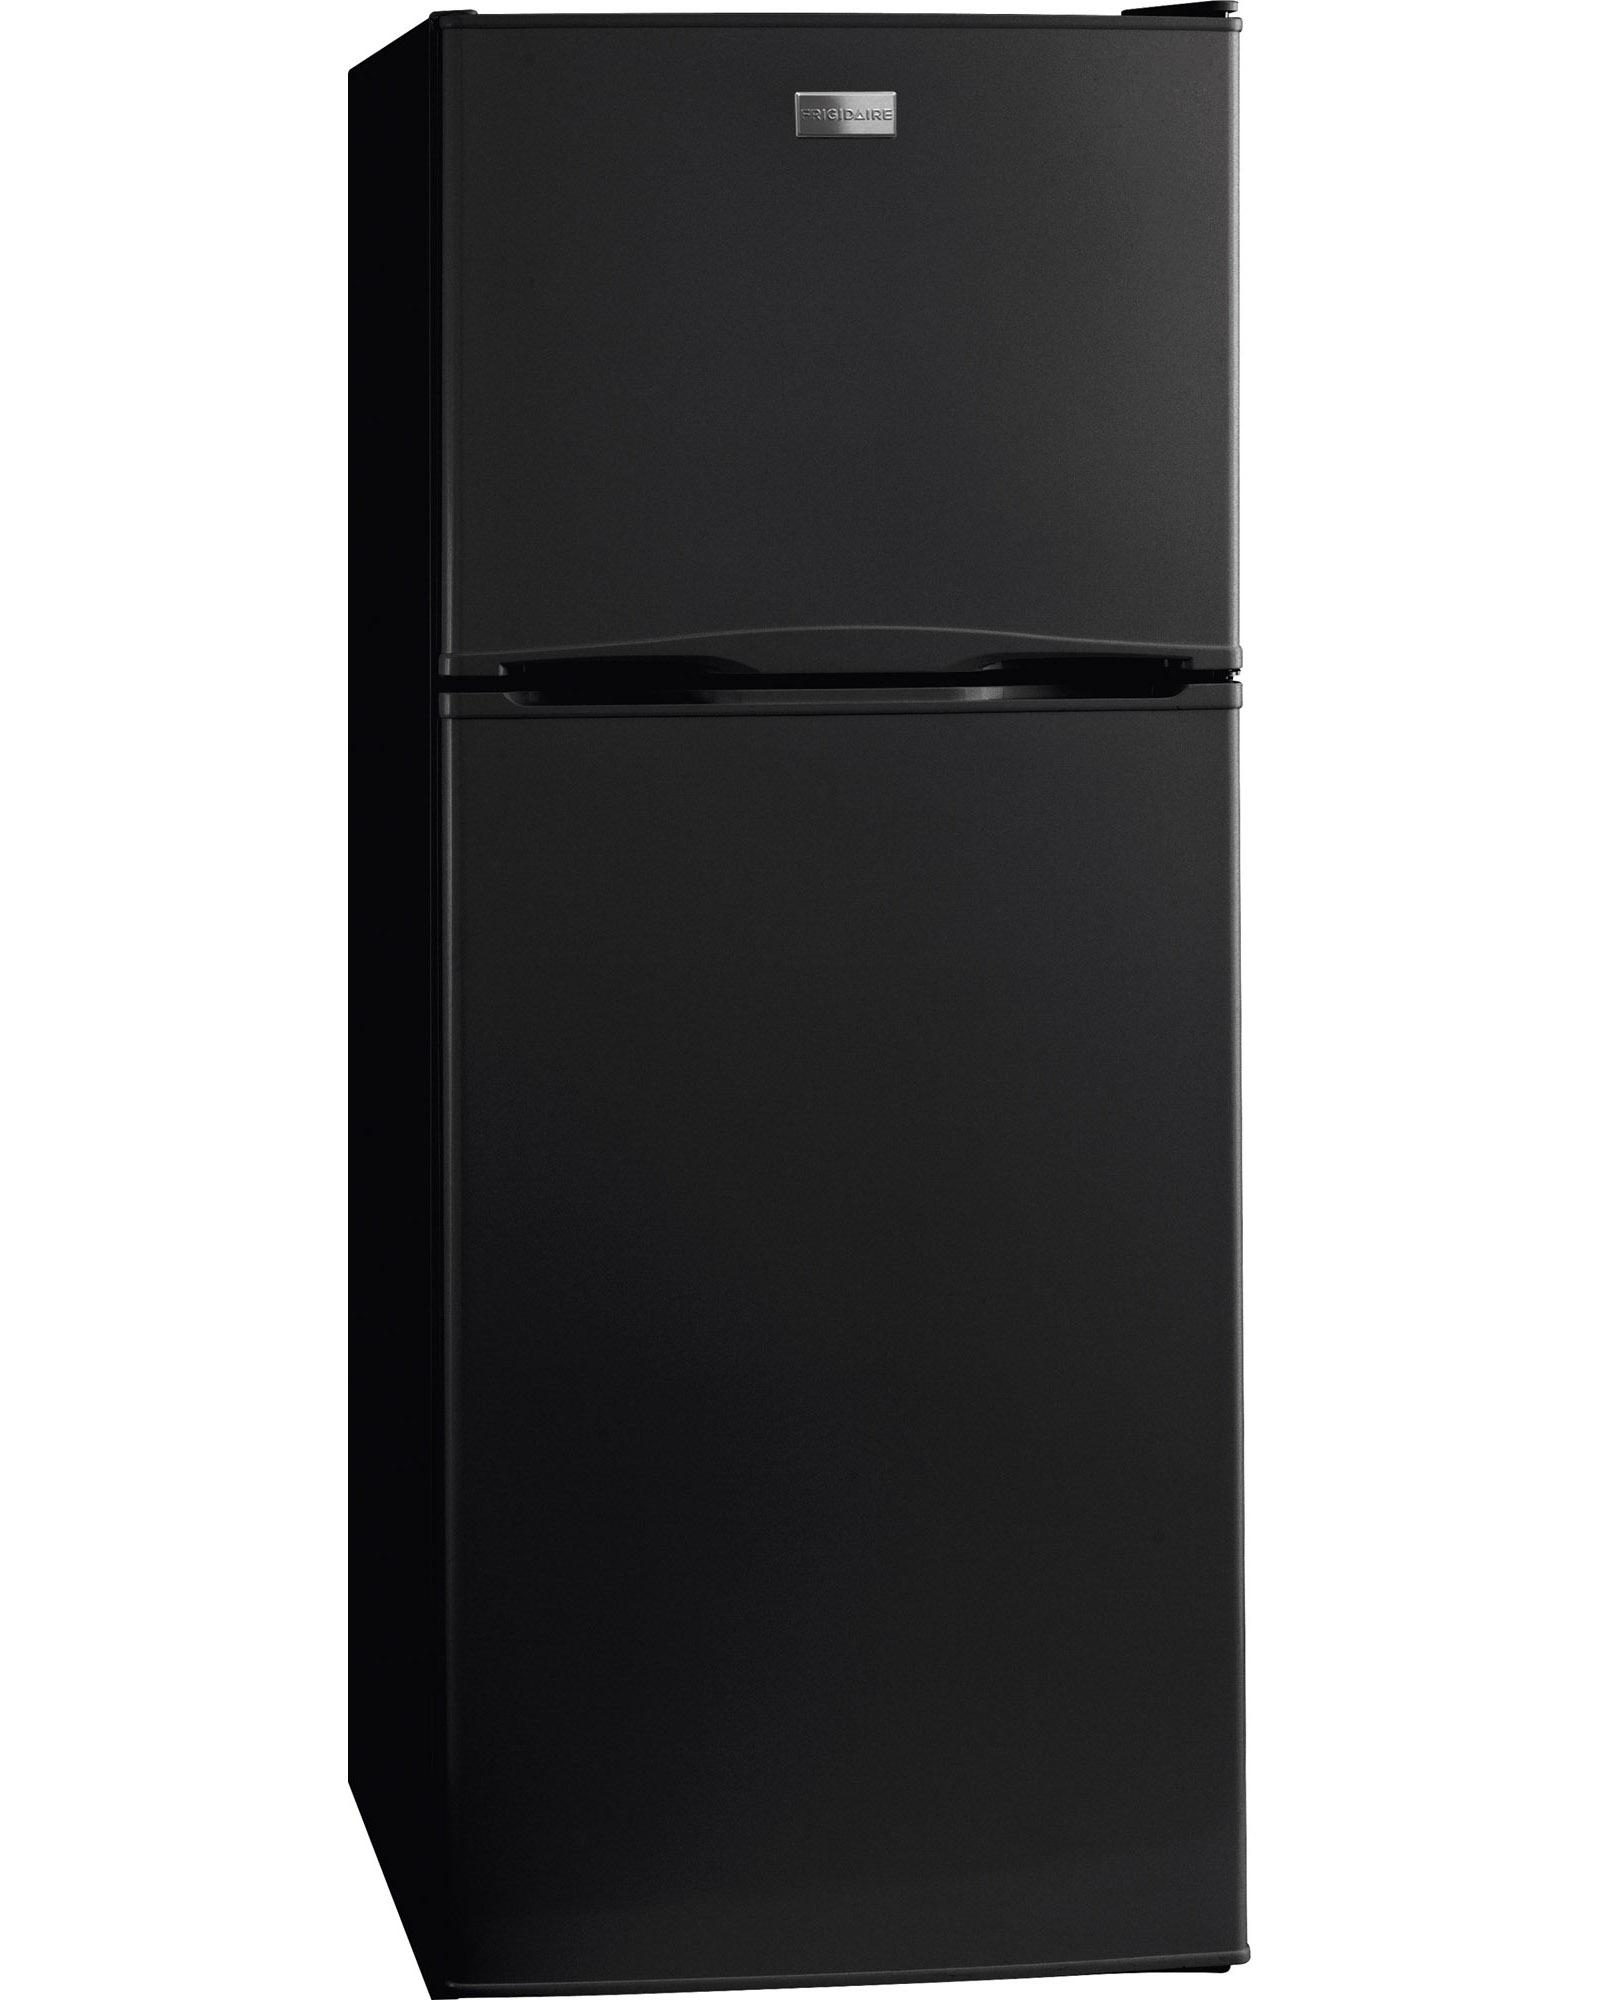 Frigidaire FFTR1022QB 10 cu. ft. Top Freezer Refrigerator - Black